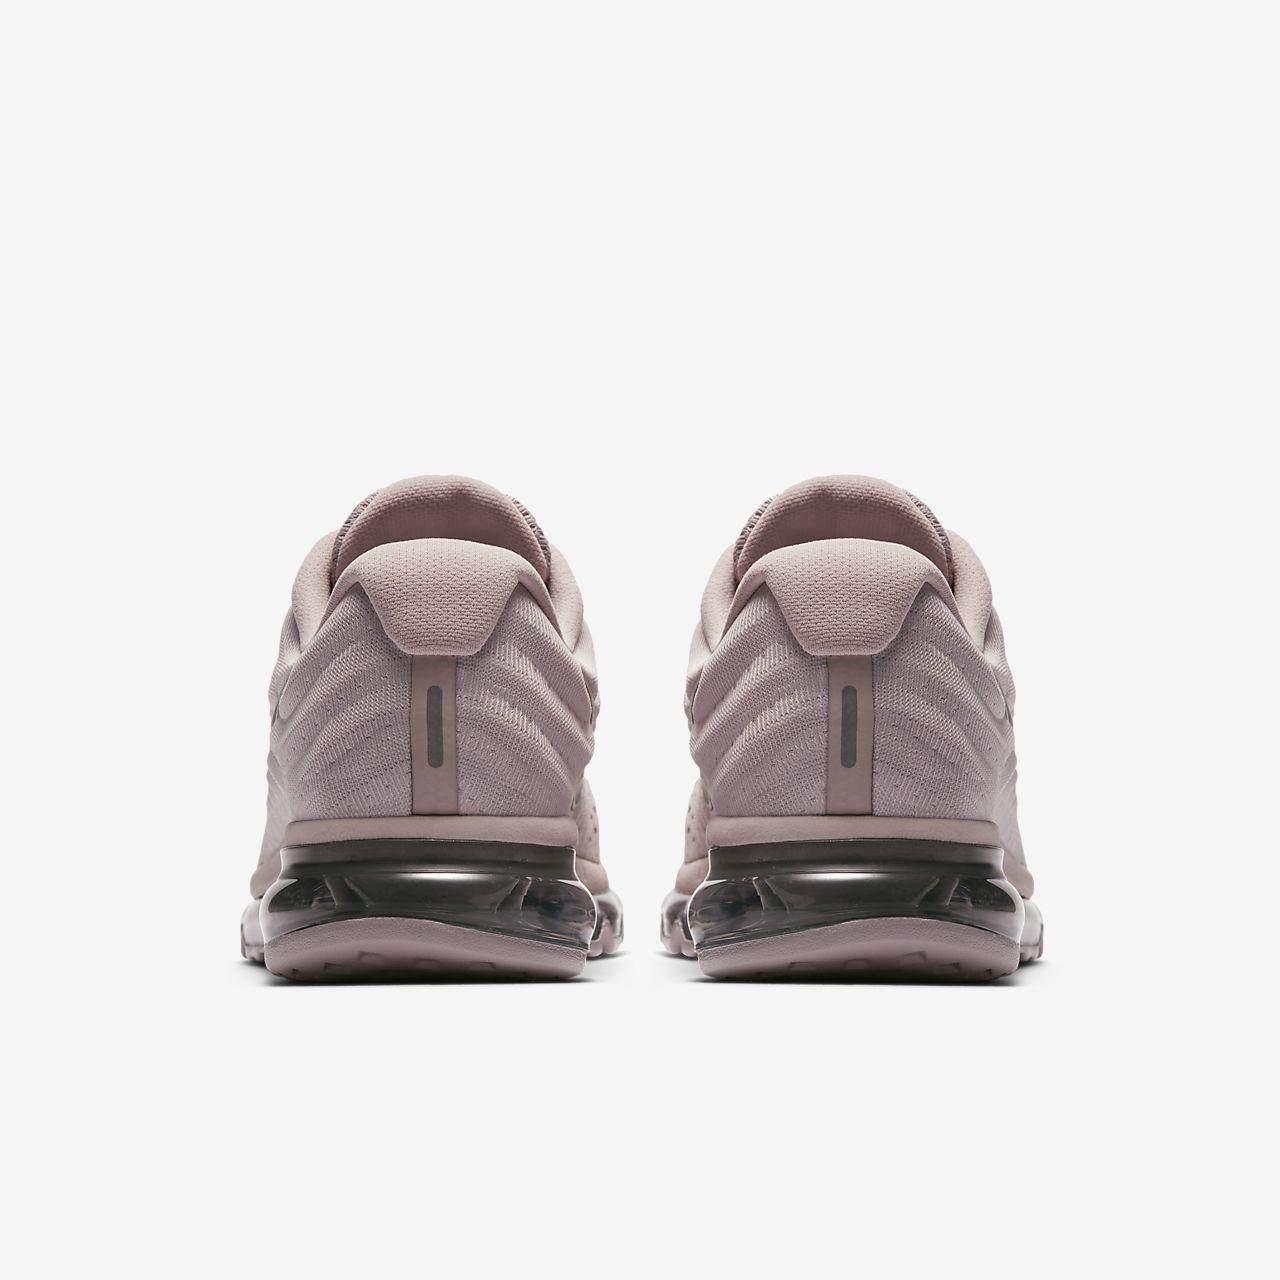 d40fc49c92c7fd Nike Air Max 2017 SE Men s Shoe. Nike.com GB